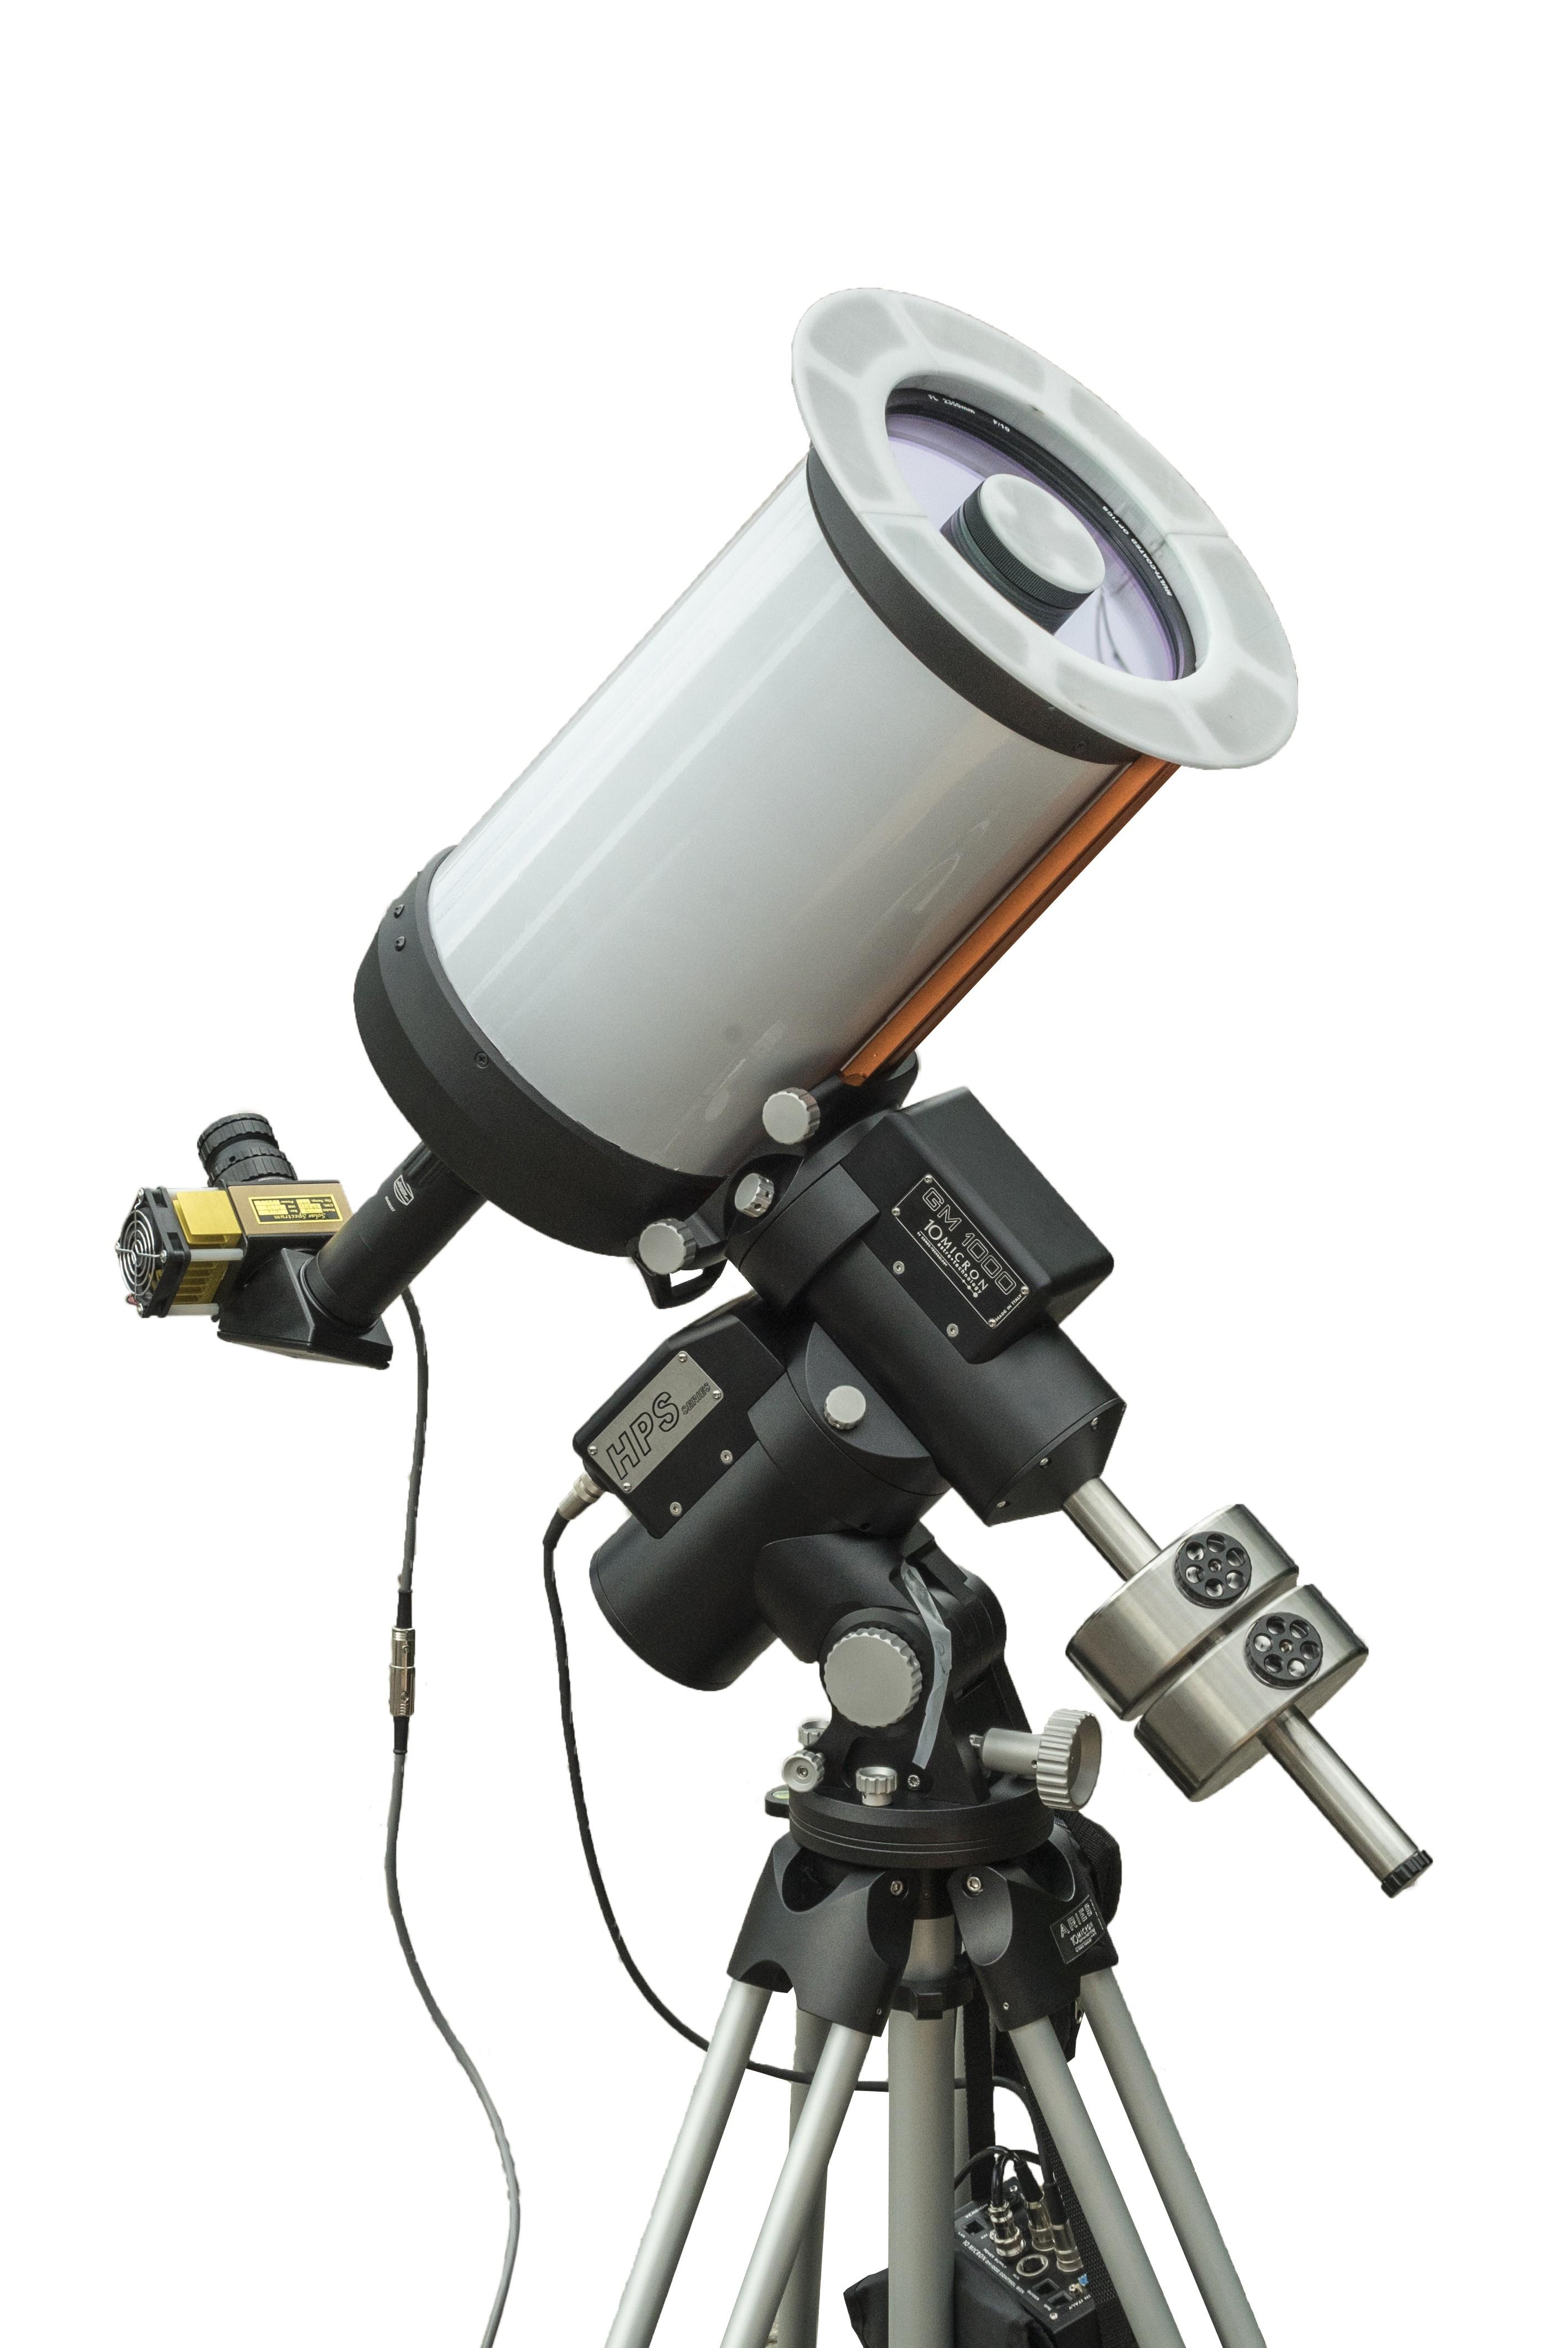 Triband-SCT - Schmidt-Cassegrain-based Multi-Purpose-Telescope, for Sun and Deep Sky